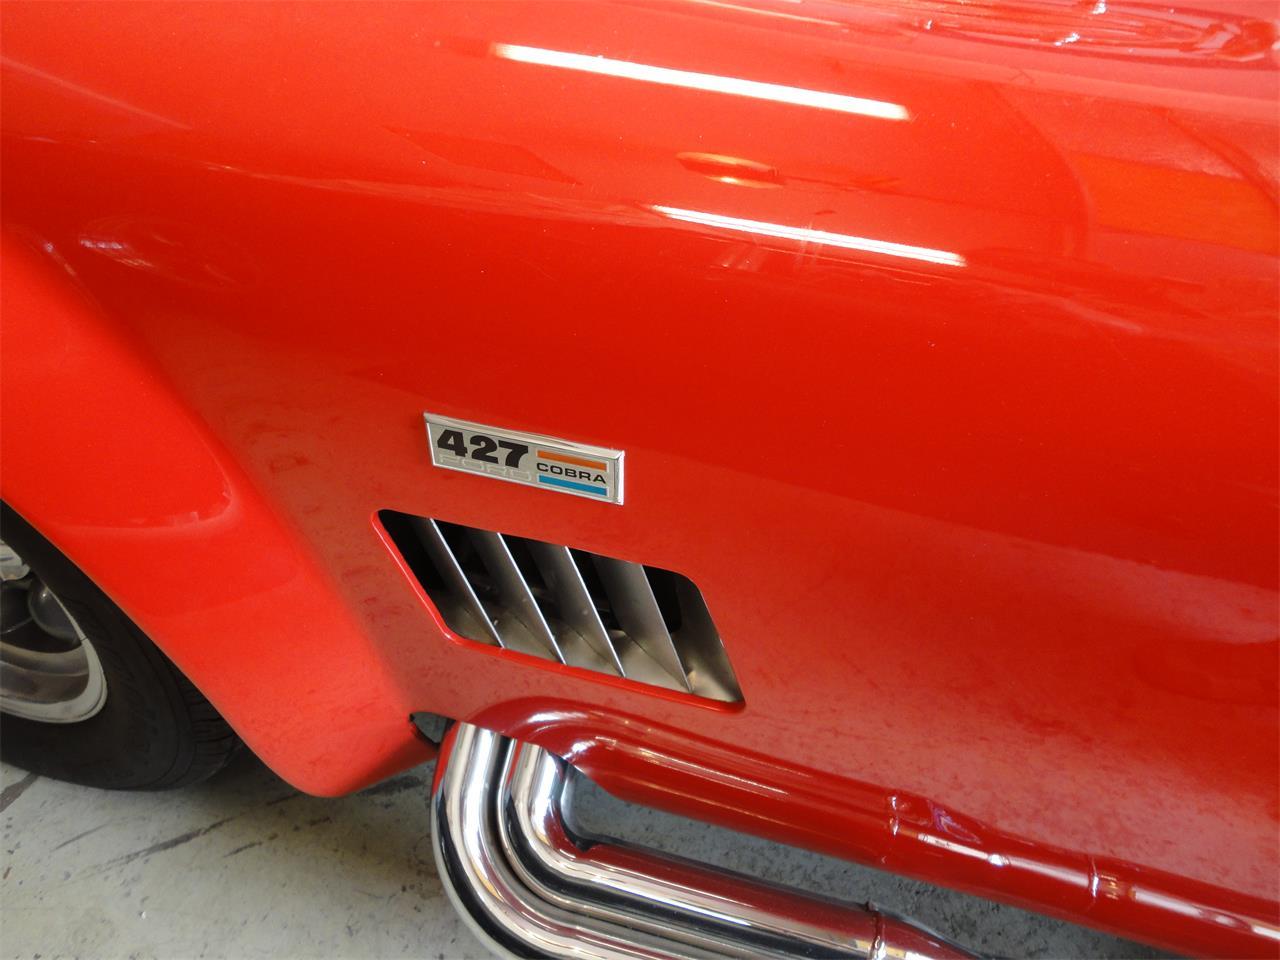 1966 Shelby Cobra Replica (CC-1189287) for sale in Porter, Indiana